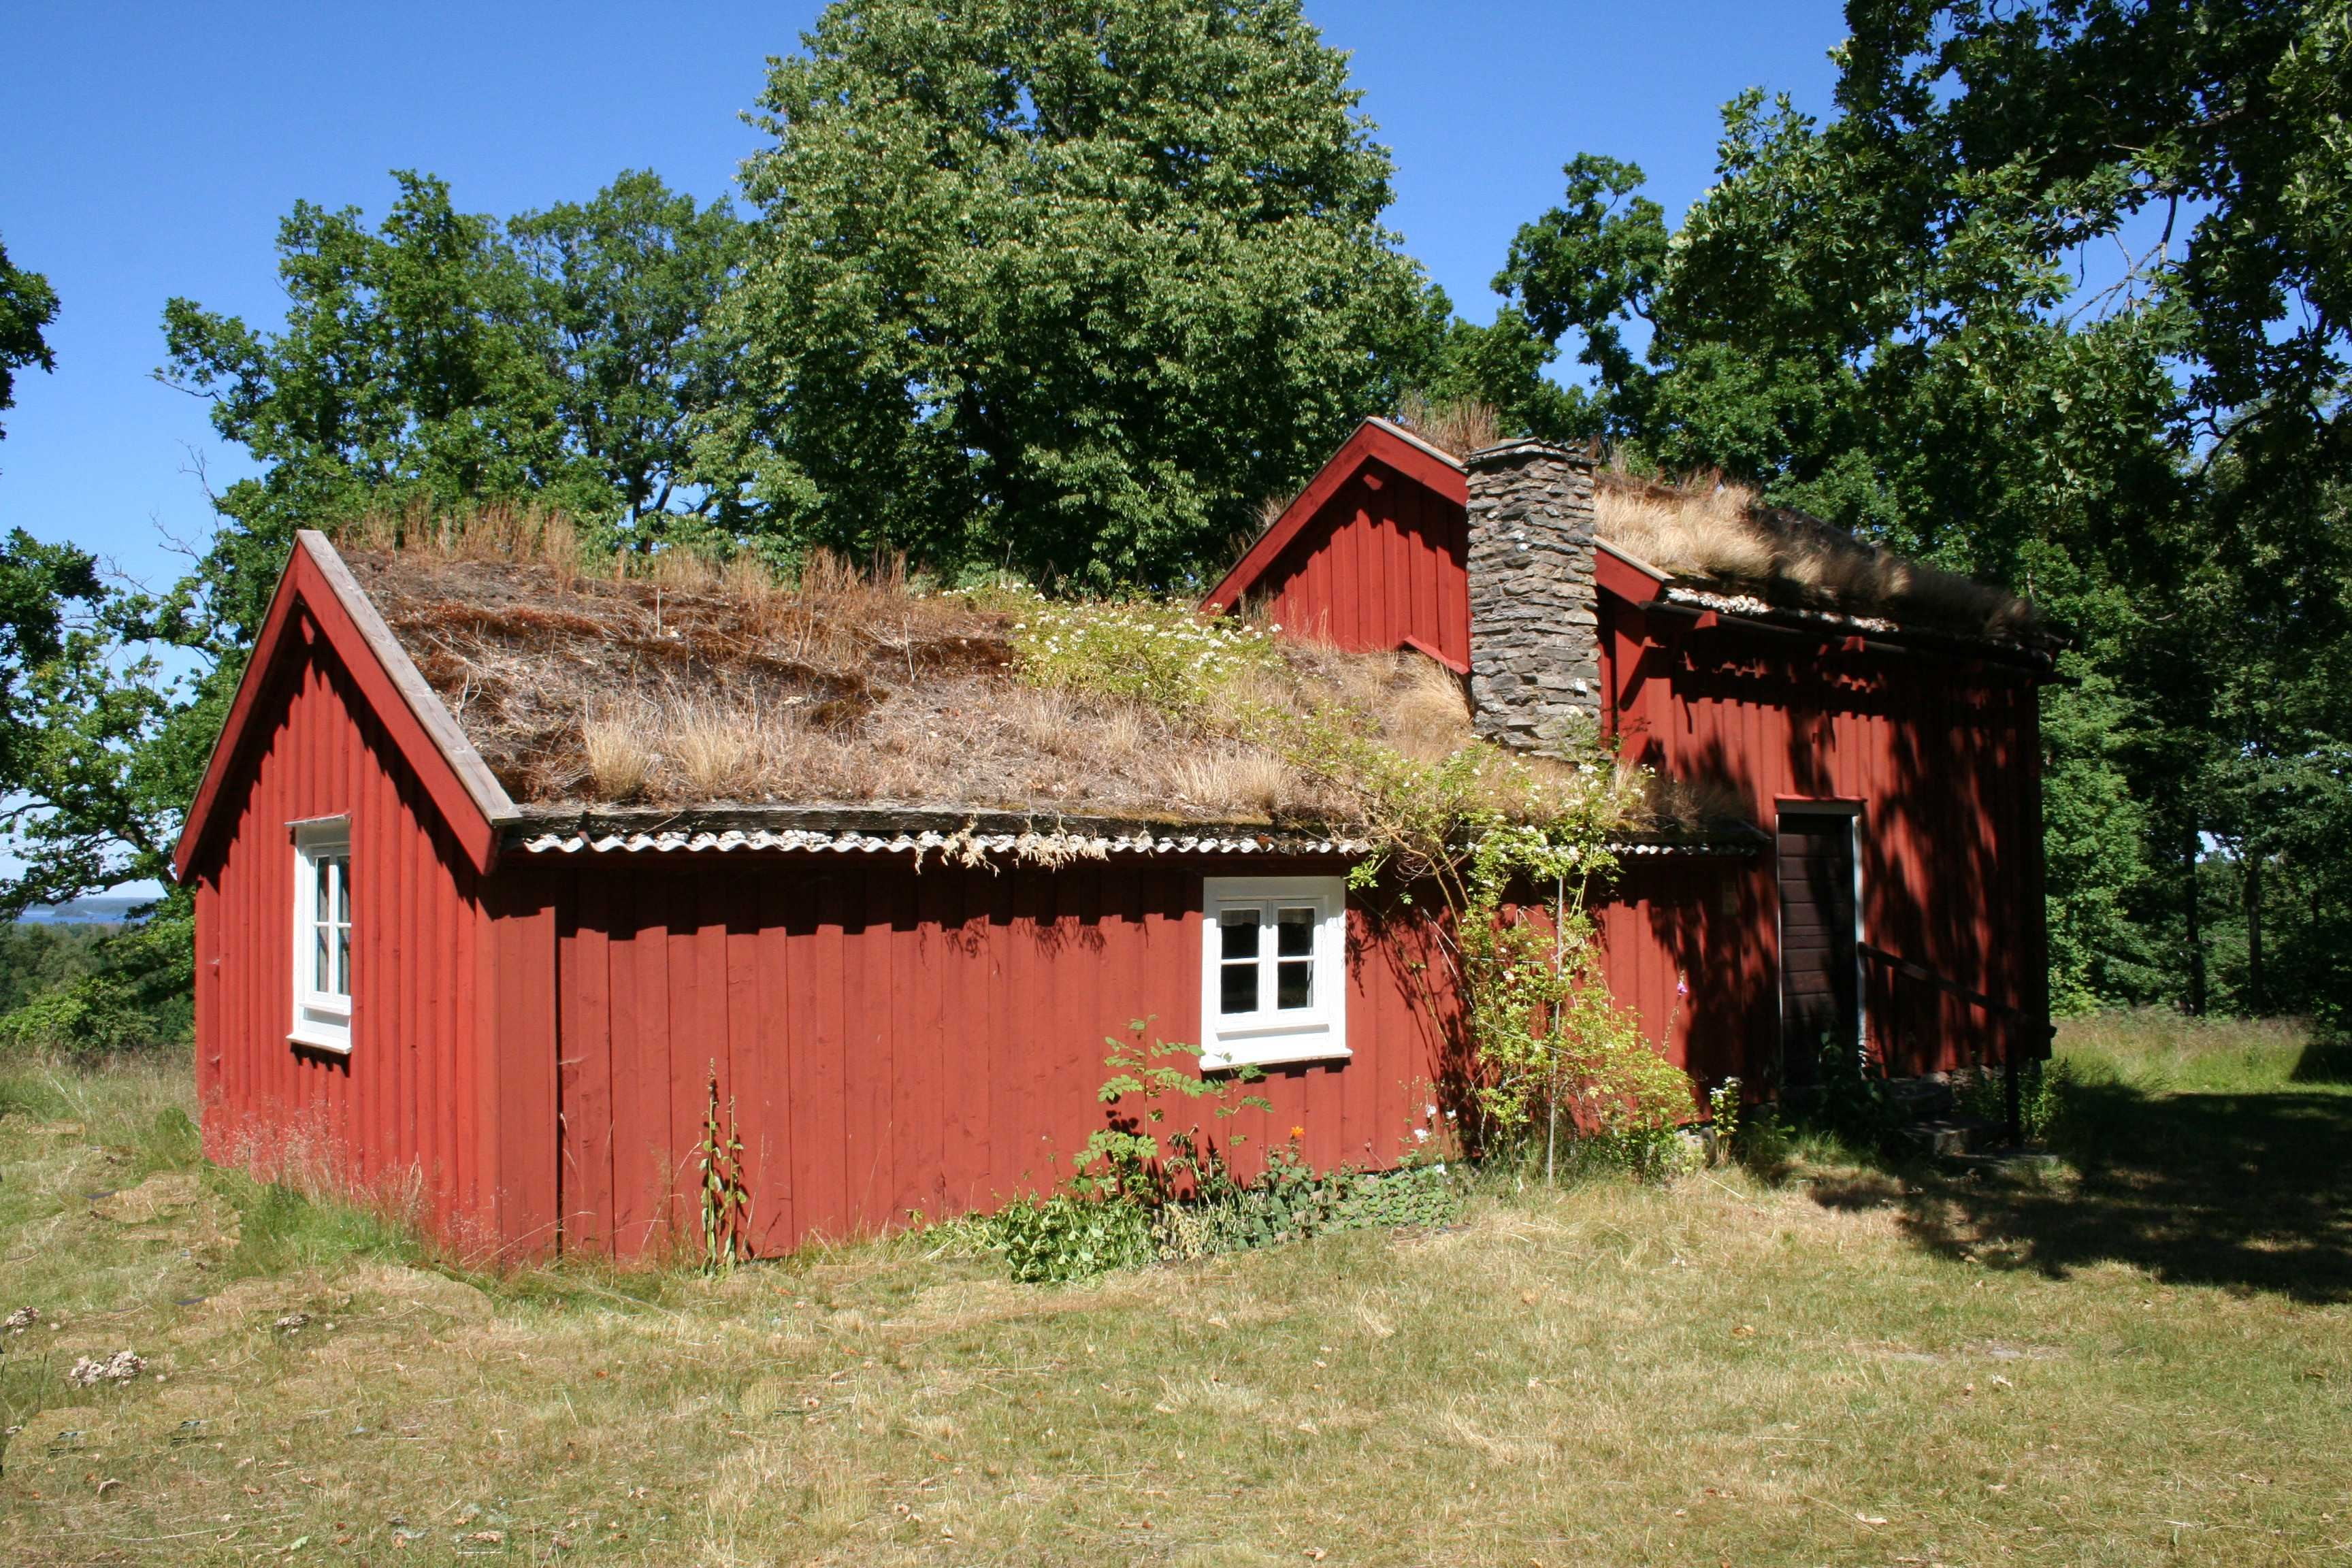 © Tingsryds Kommun, Lunnabacken